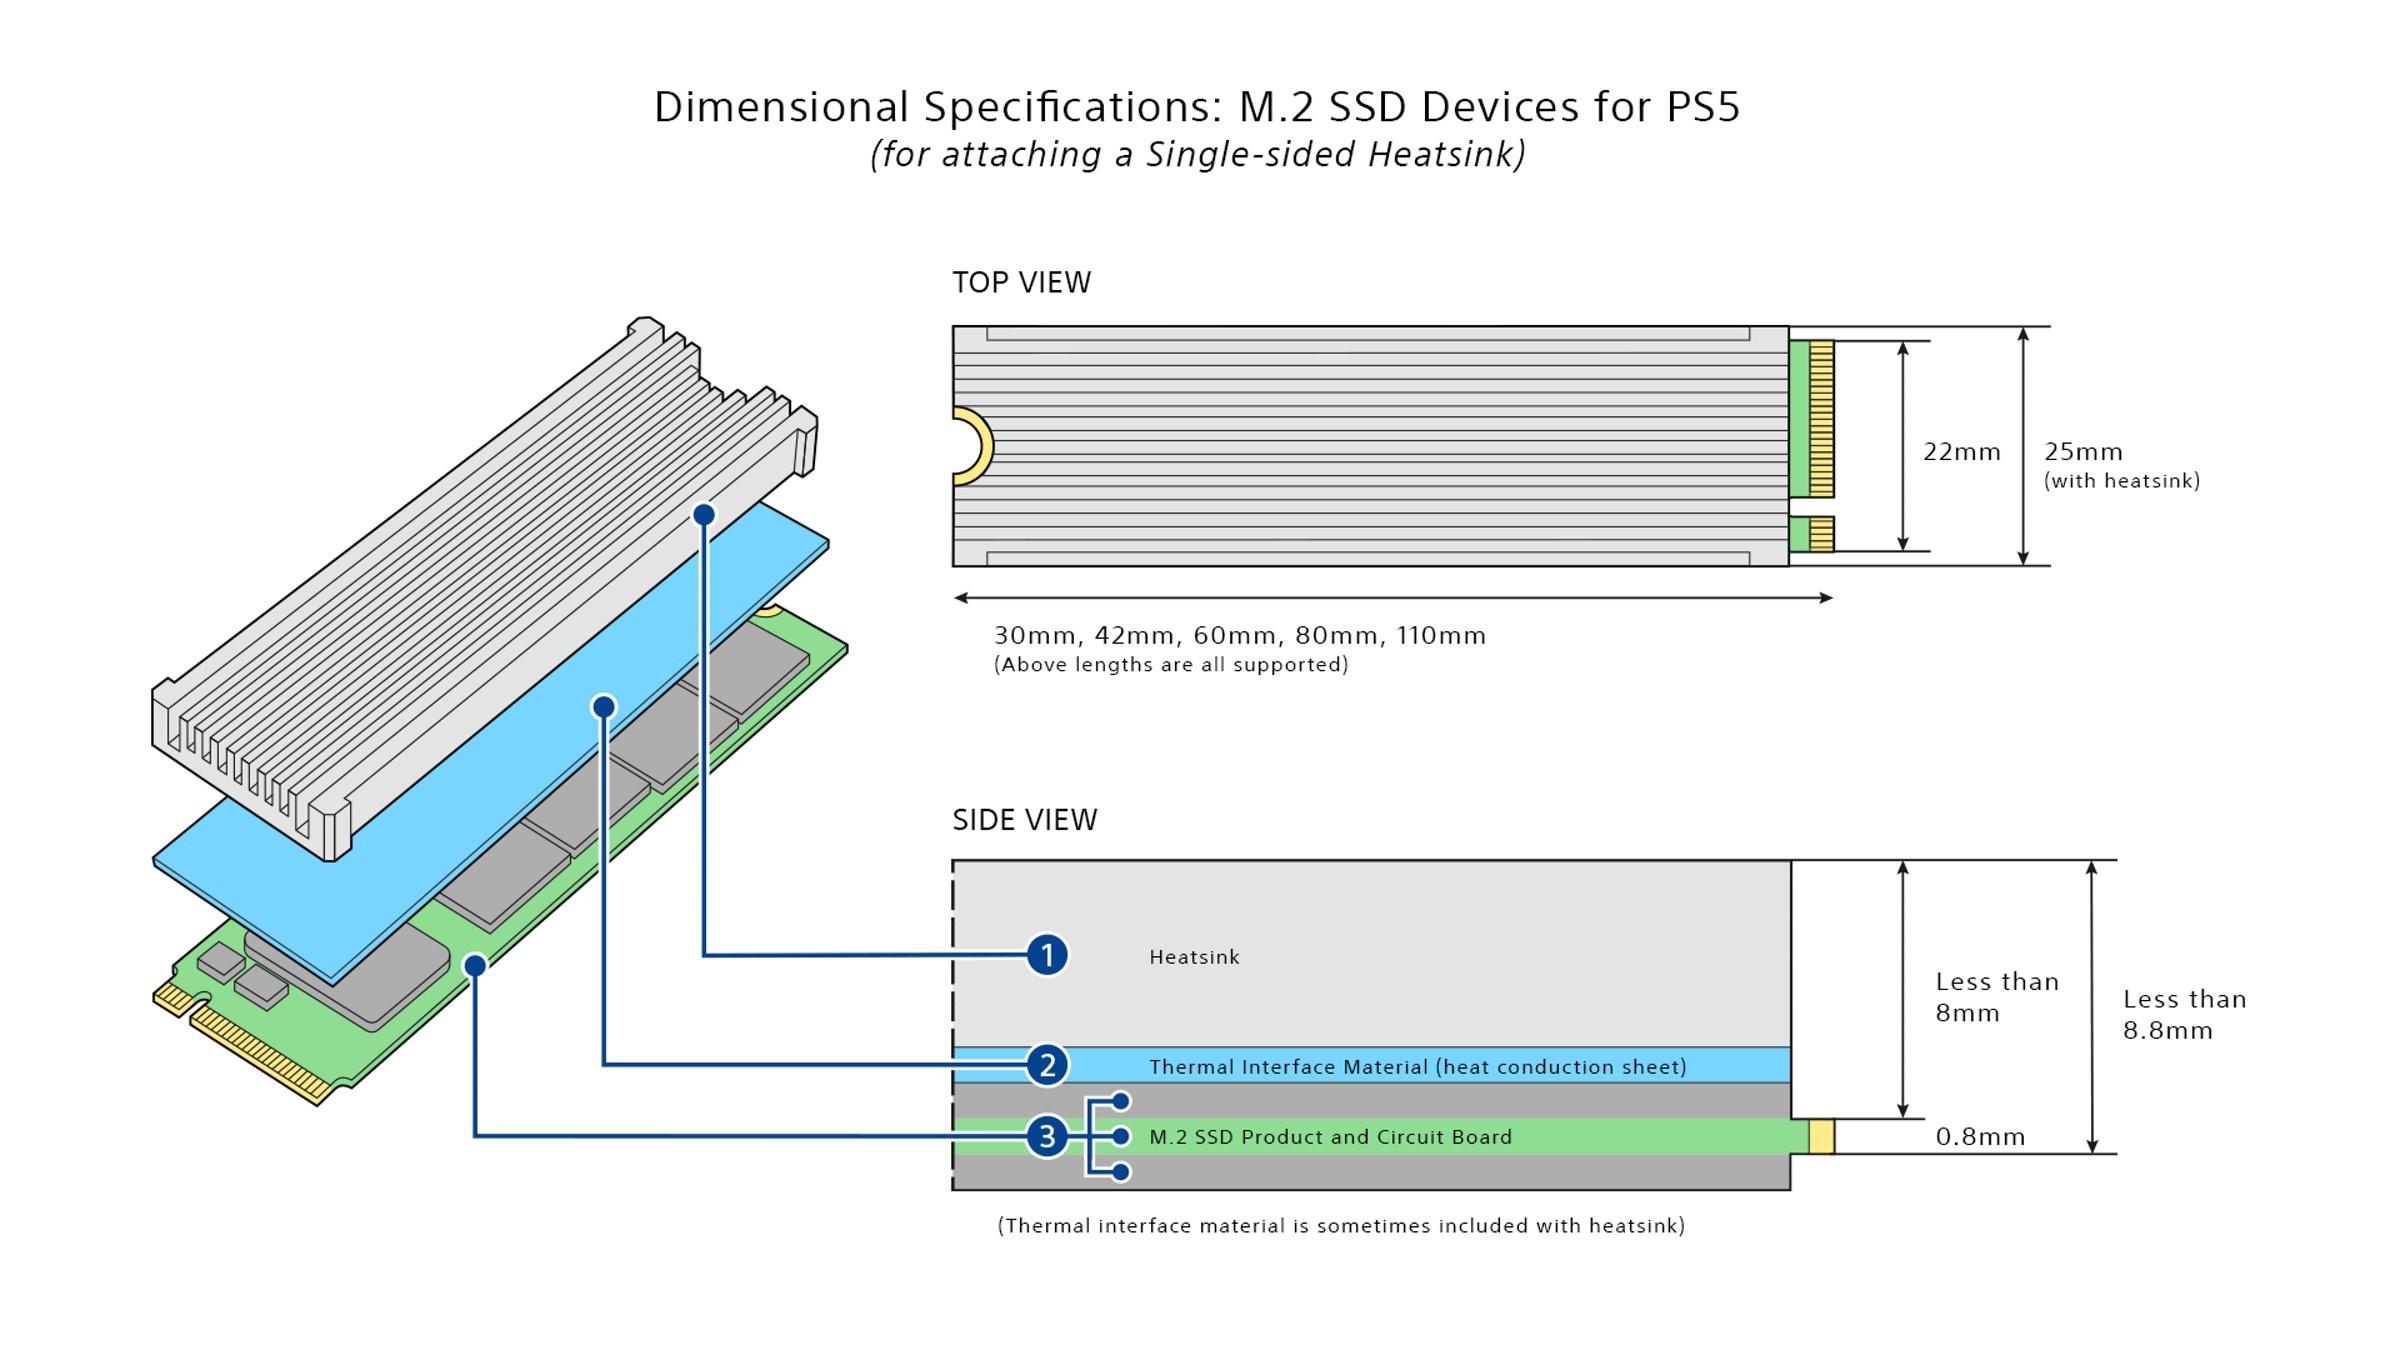 PS5 M.2 SSD كيفية إضافة بلايستيشن 5